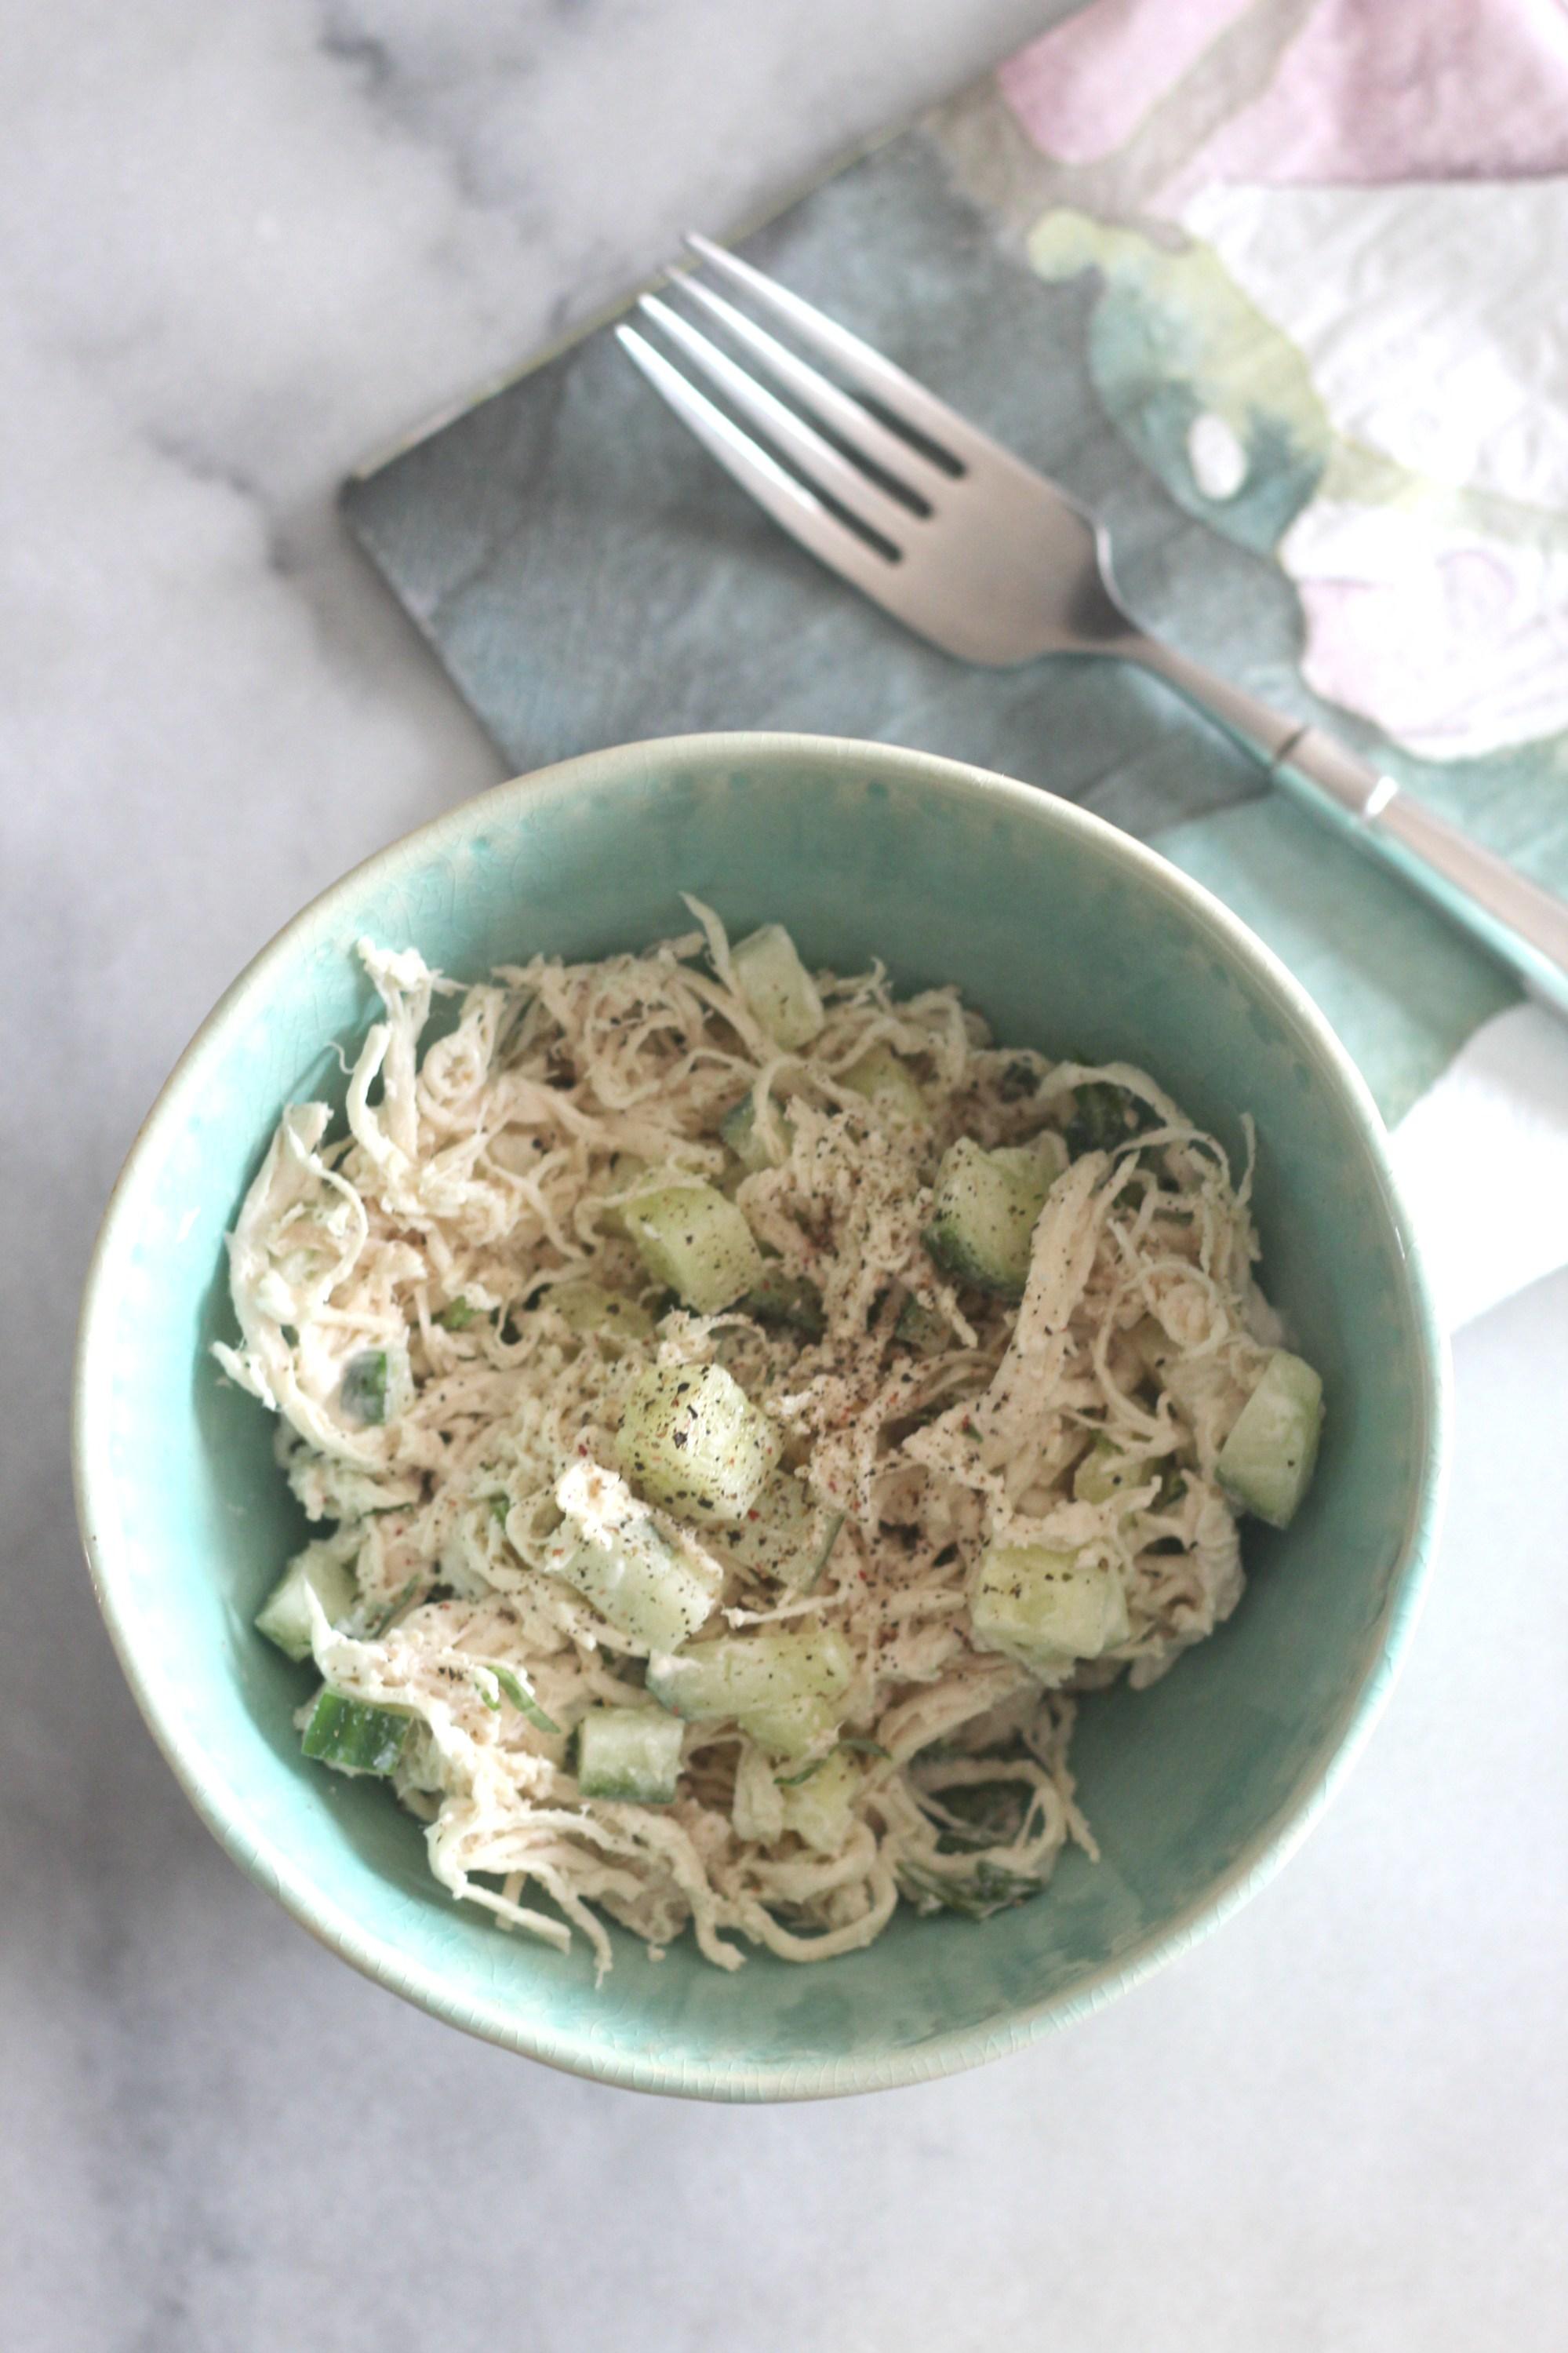 Source:  https://lowcarbdelish.com/cucumber-basil-chicken-salad/